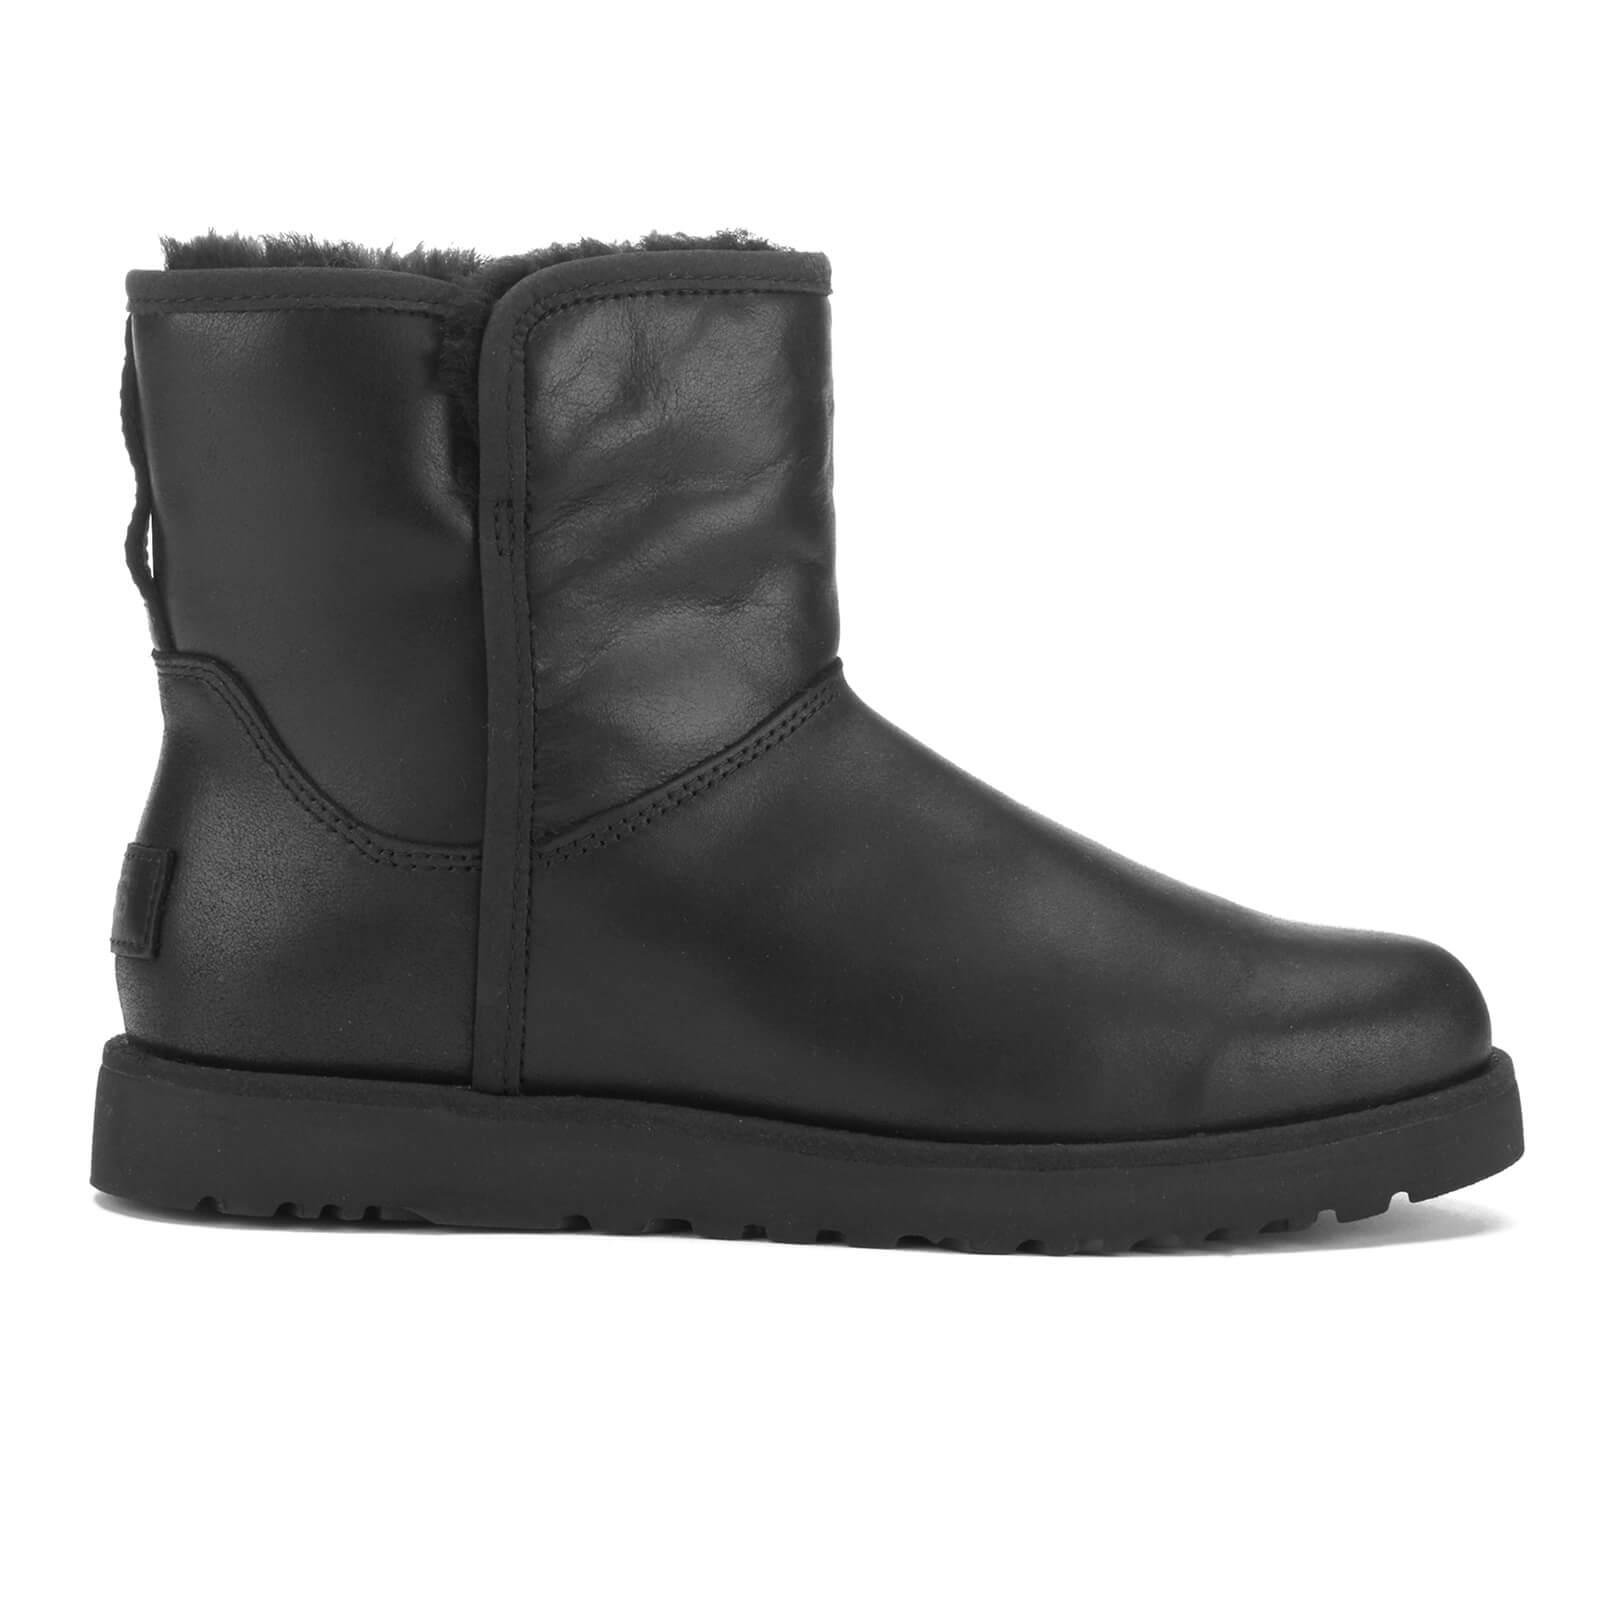 1fbb56708cd UGG Women's Cory Leather Classic Slim Sheepskin Boots - Black